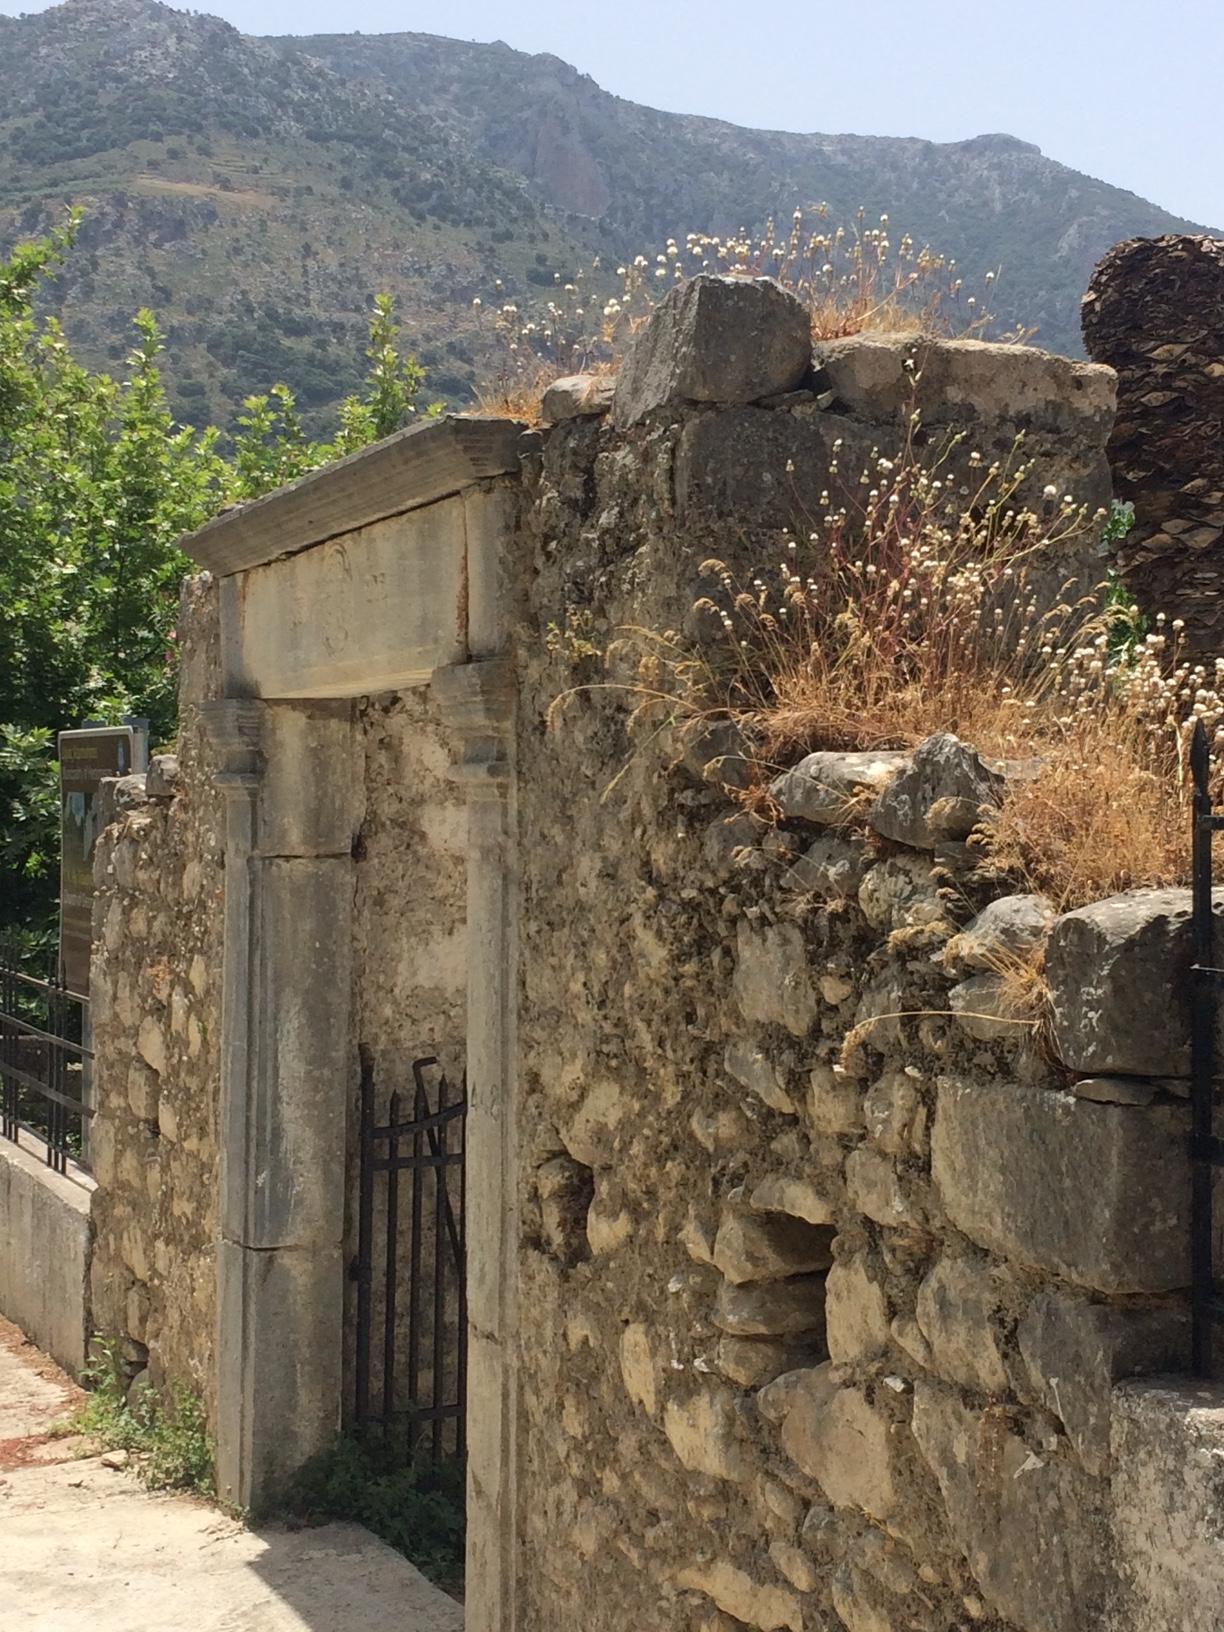 Avdou Village Crete Greece Country Natural Beauty